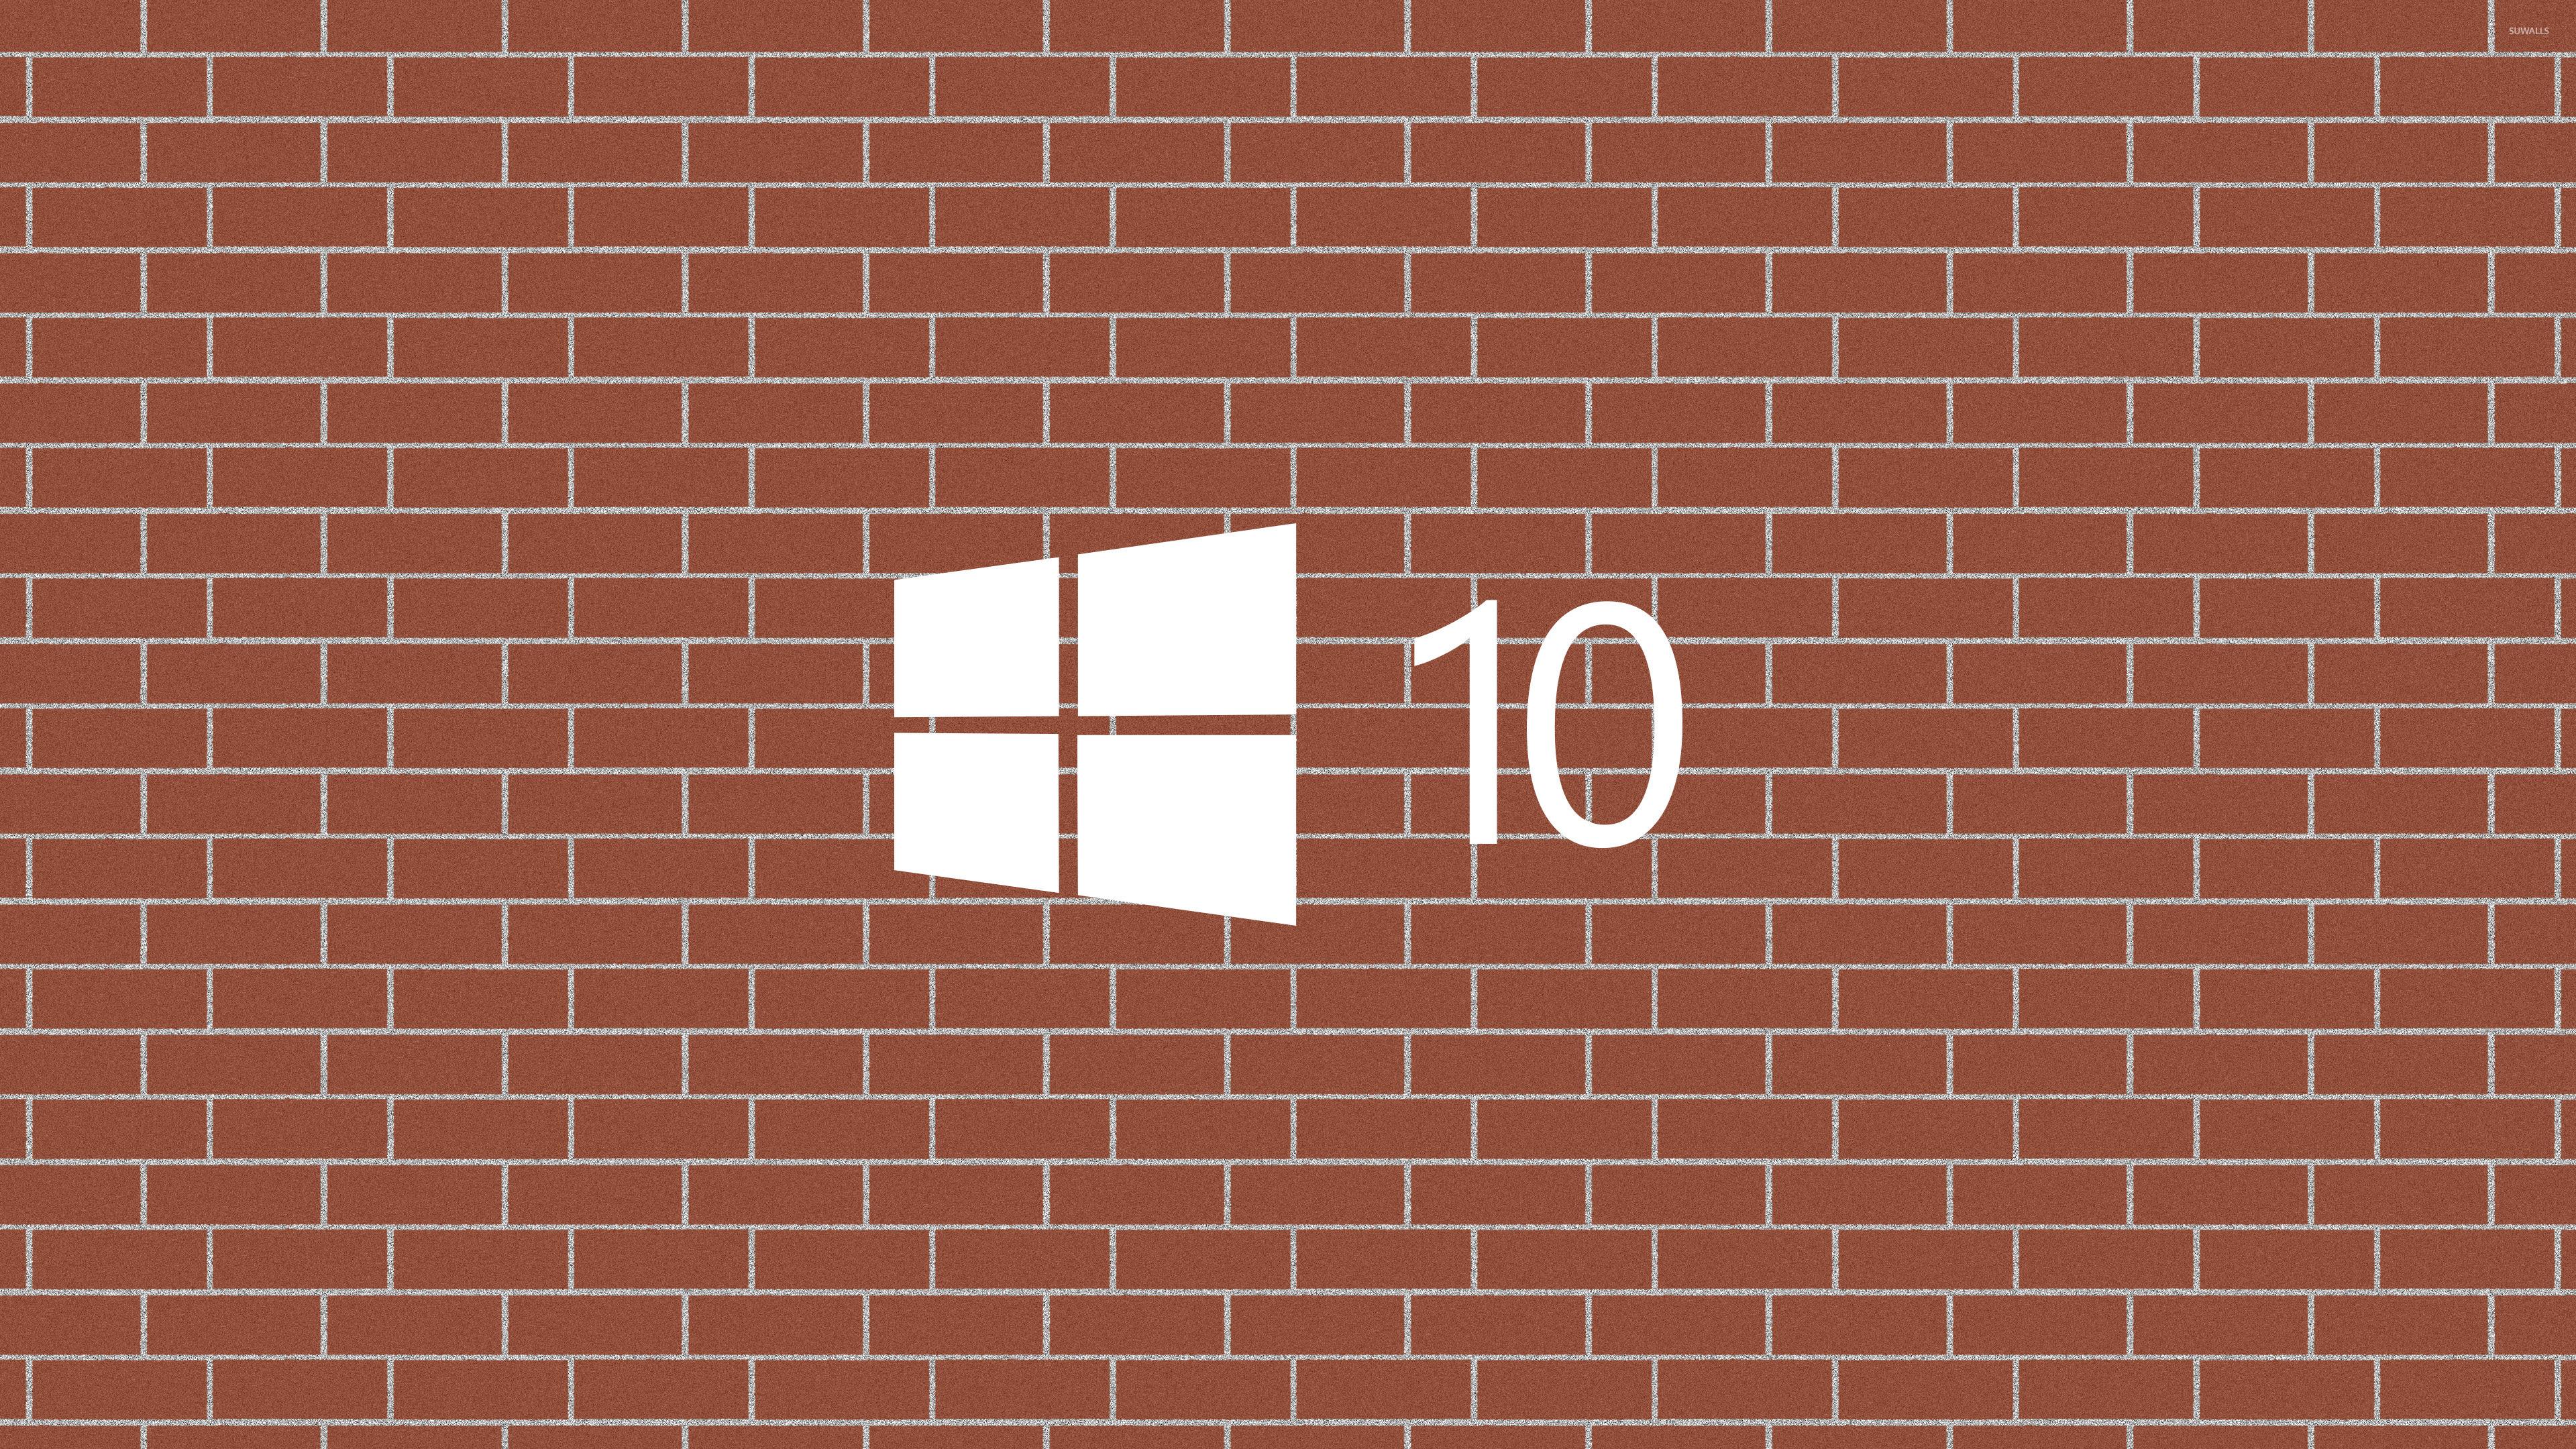 Windows 10 white logo on a brick wall wallpaper puter